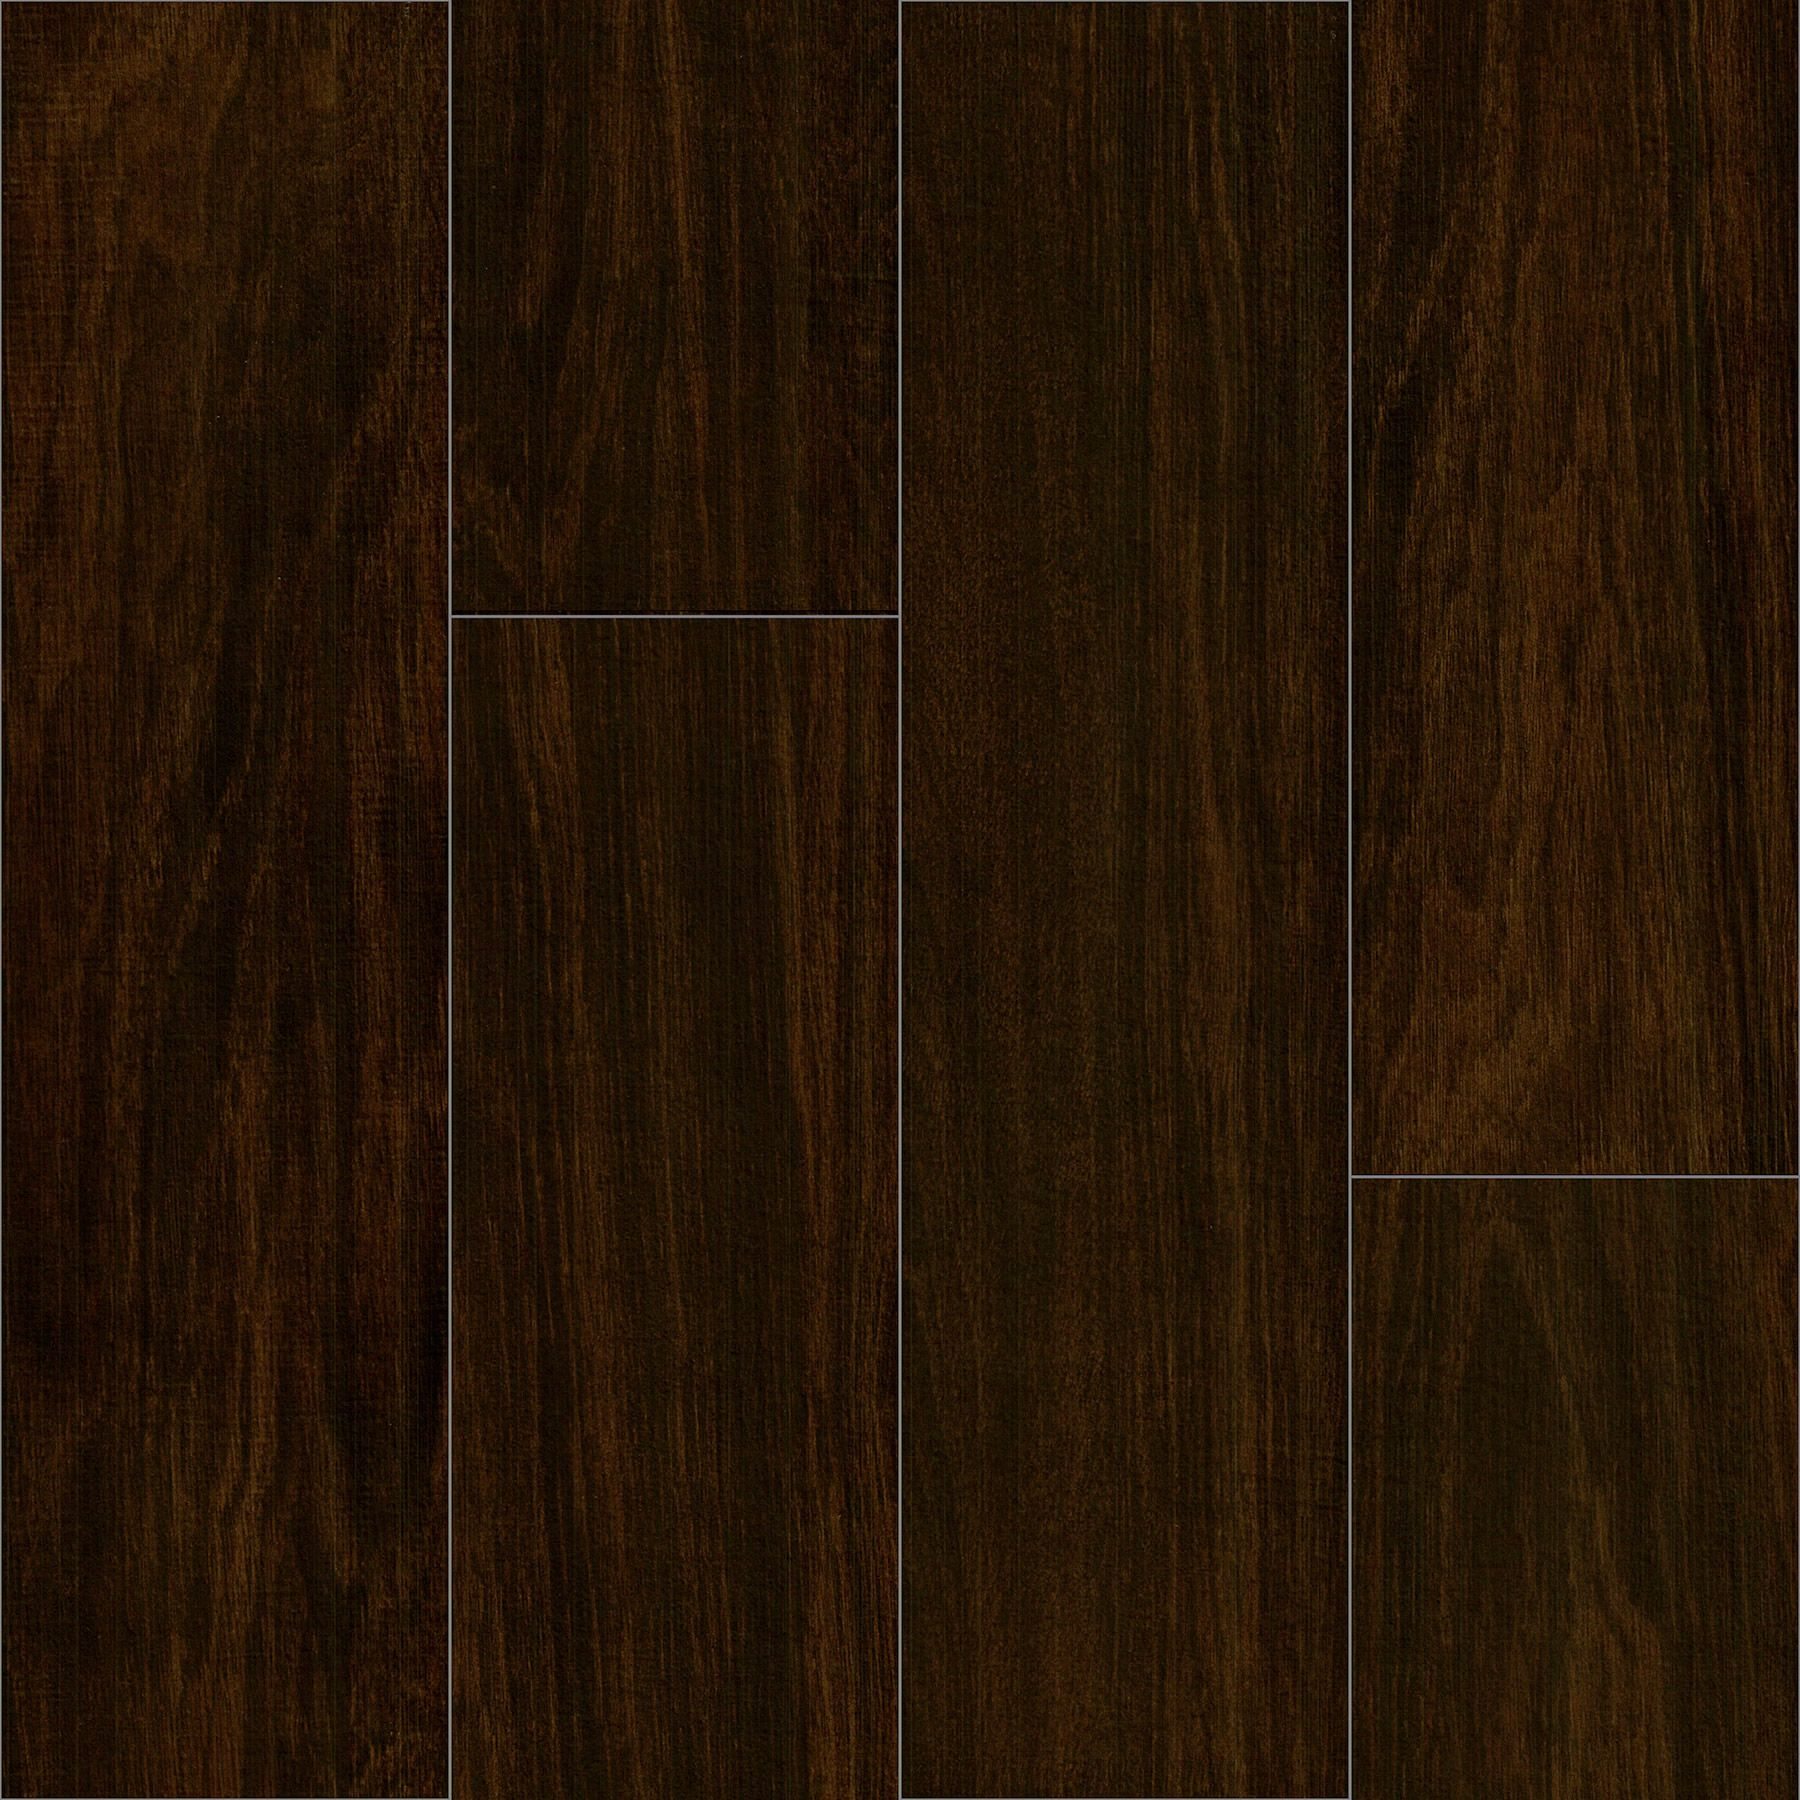 "Florida Tile Walnut 6"" x 24"" Wood Grain Porcelain Tile tile"